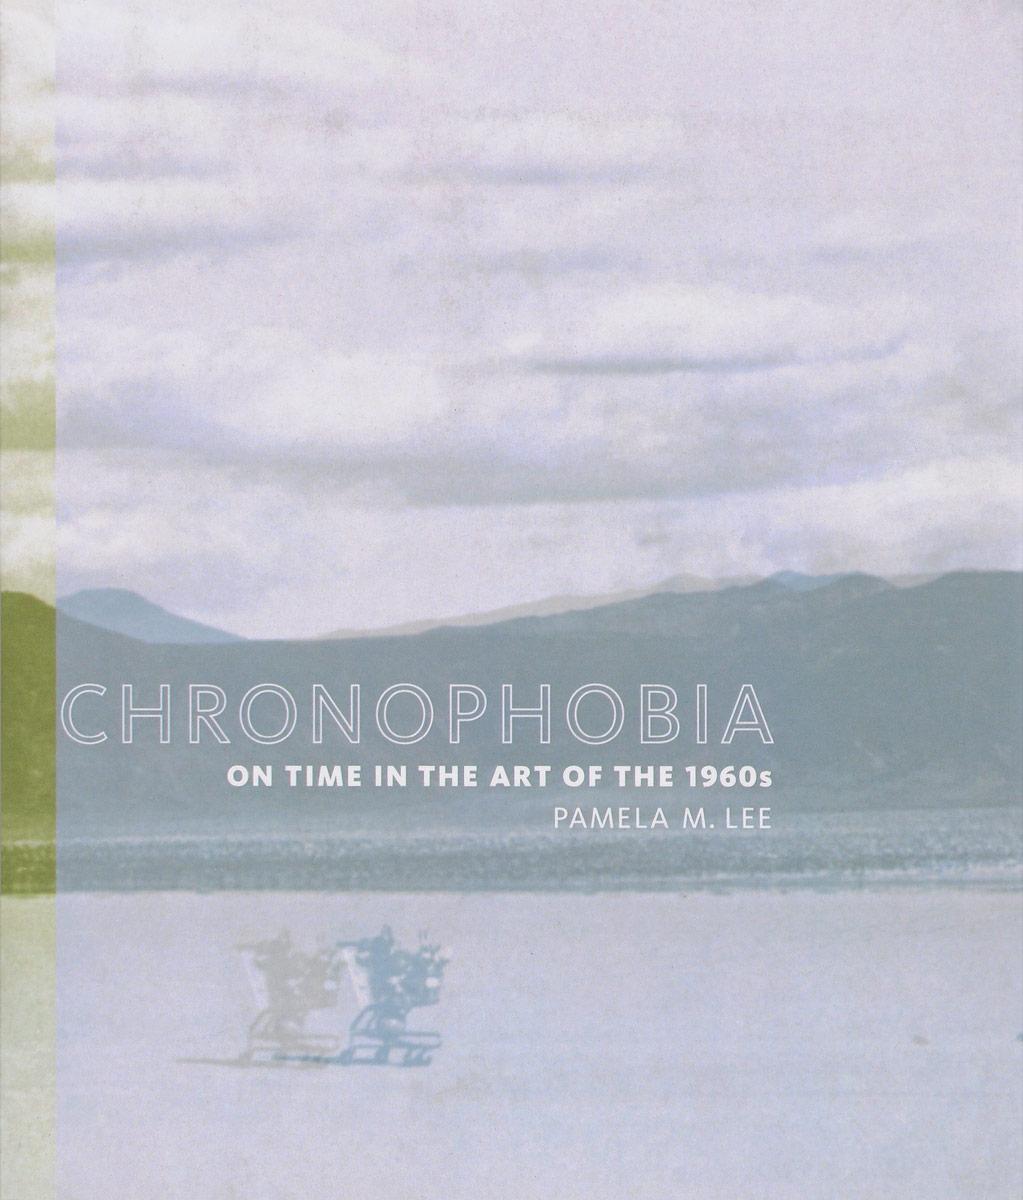 Chronophobia – On Time in the Art of the 1960s свитшот мужской с полной запечаткой printio граффити 1